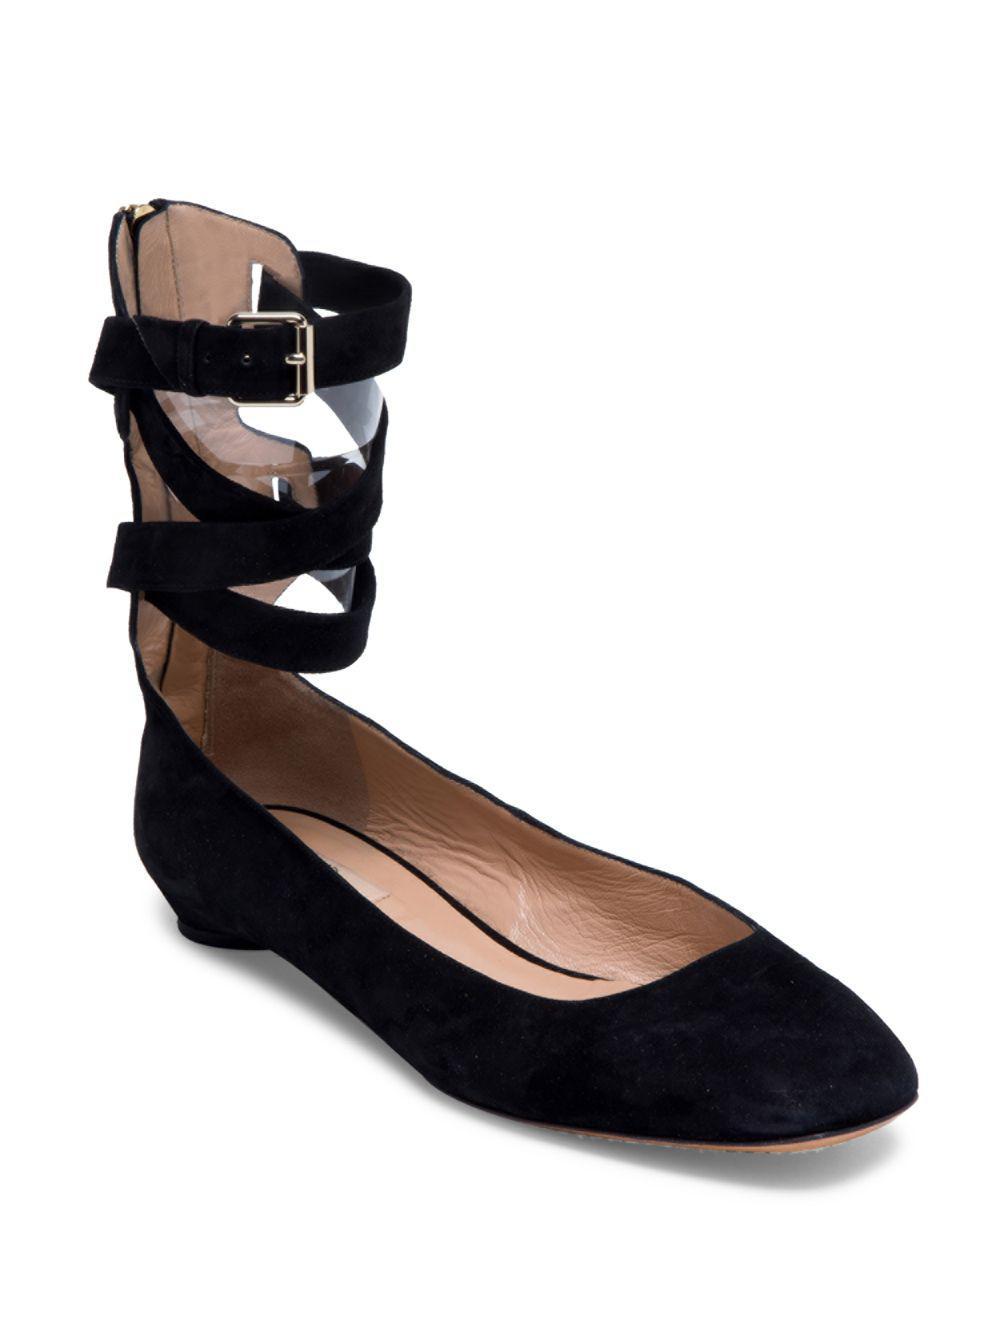 fd570e3421b5 Valentino - Black Suede Ankle Strap Ballerina Flats - Lyst. View fullscreen